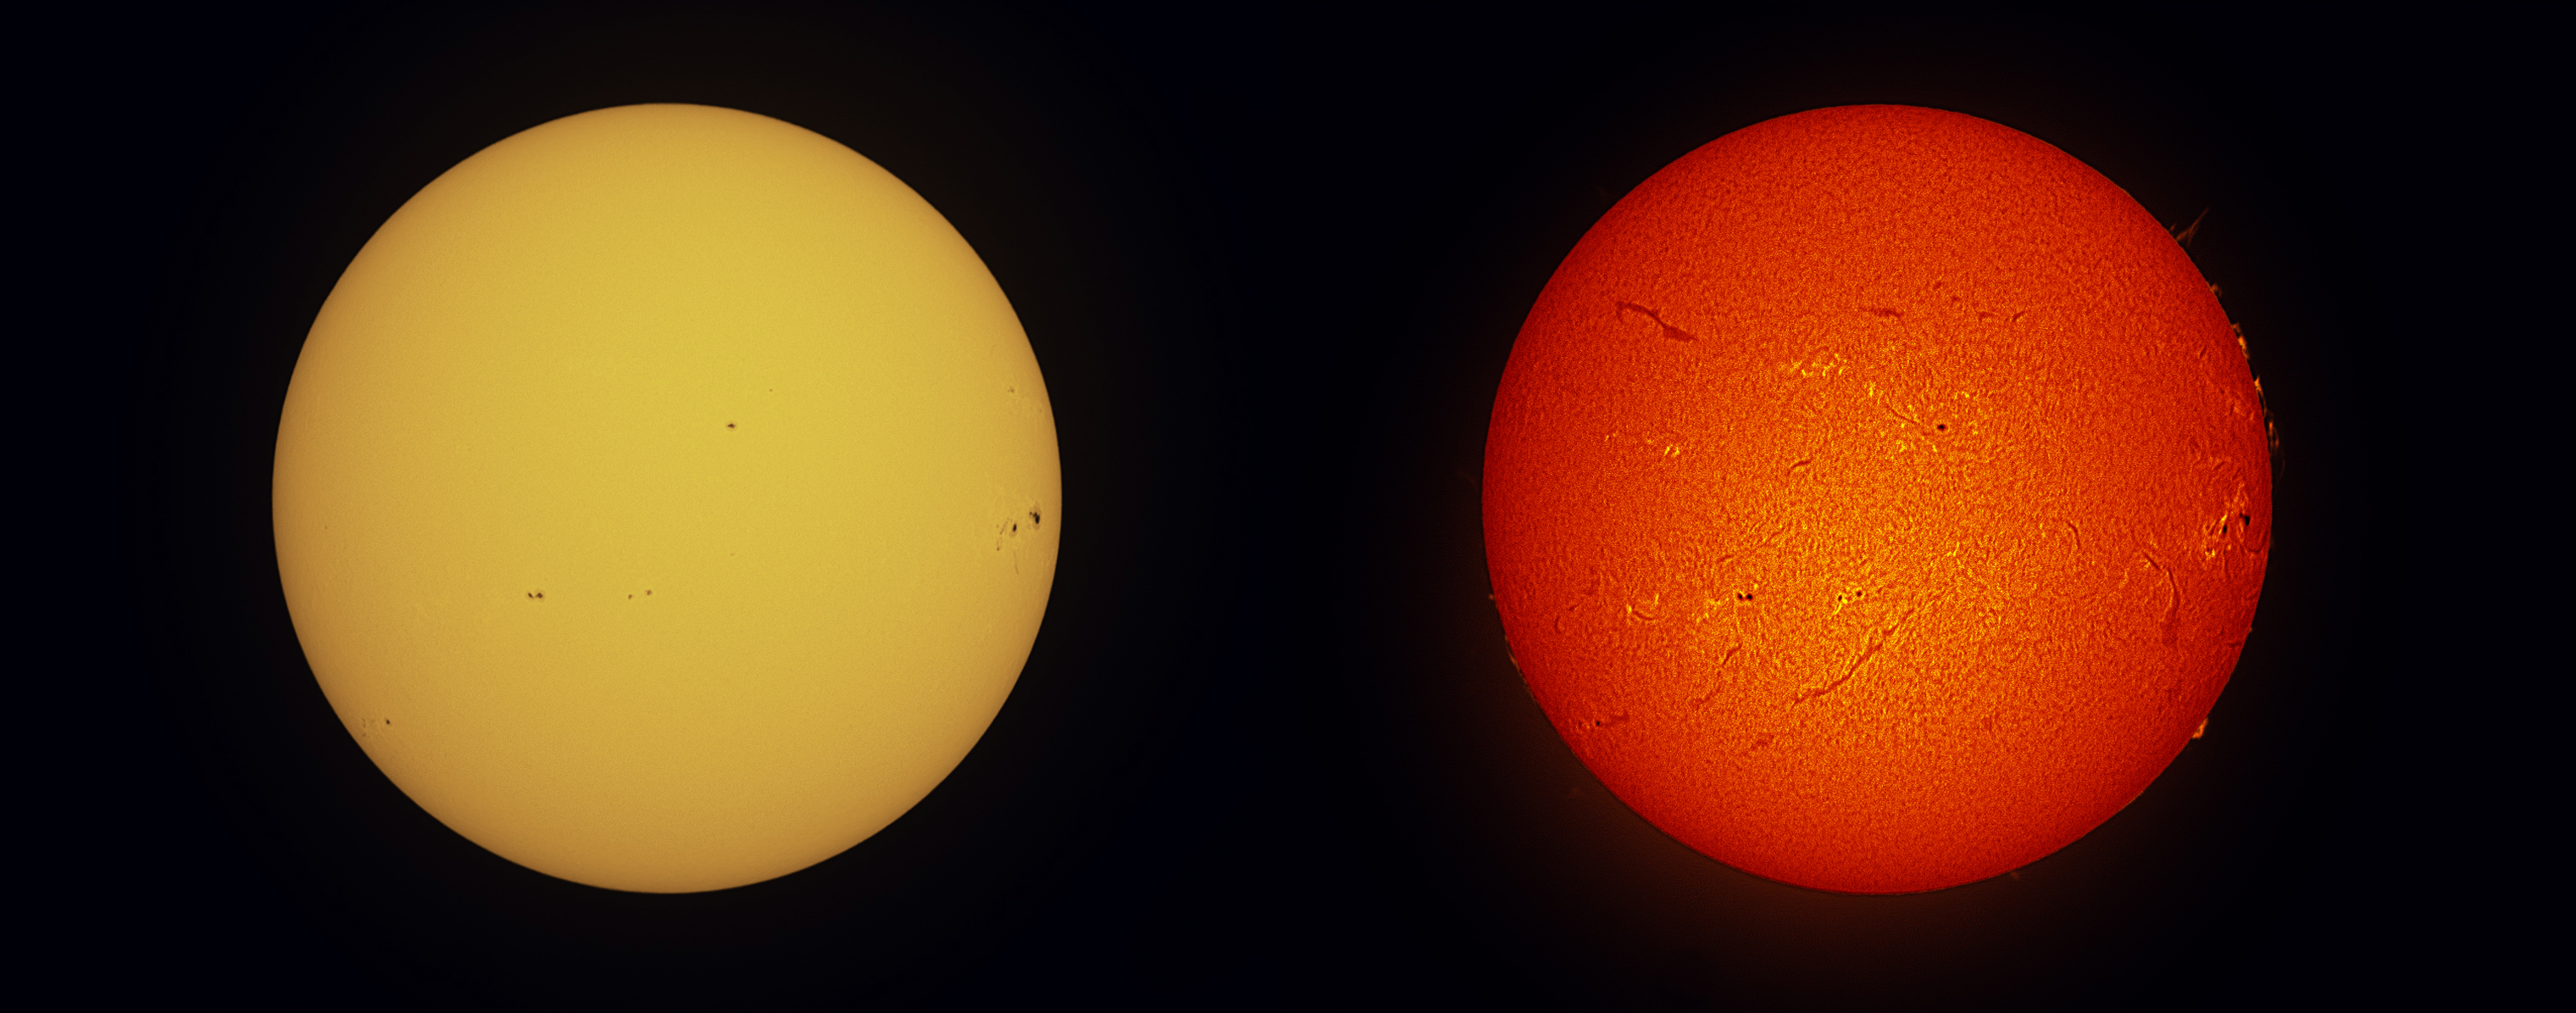 The Sun - January 12, 2014